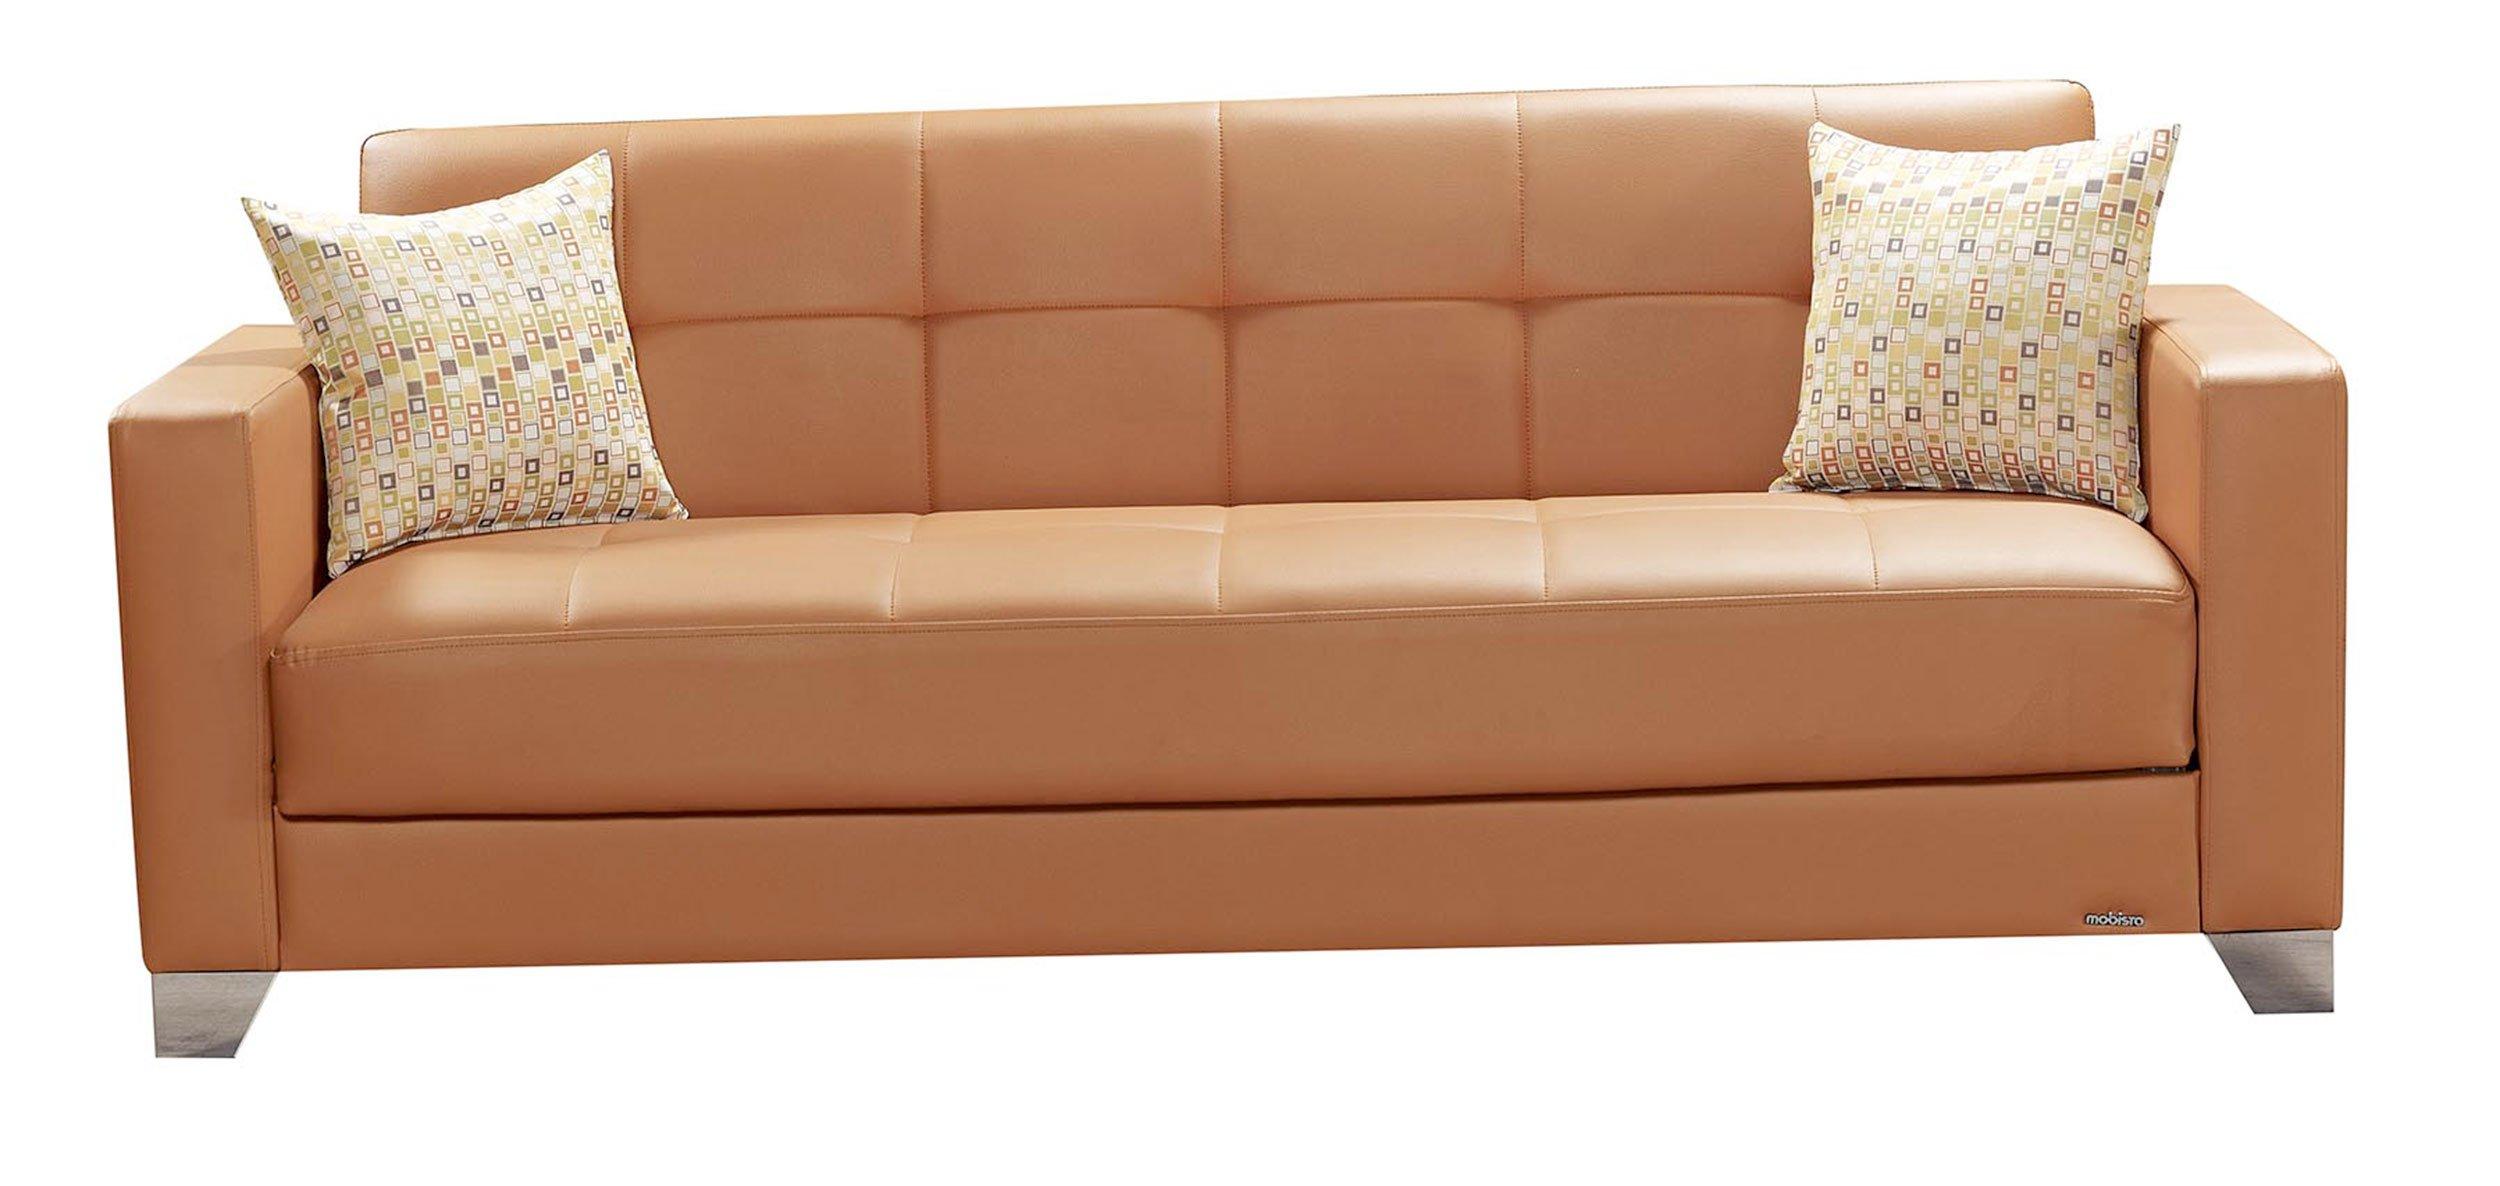 viva italia prestige orange leatherette sofa bed by mobista